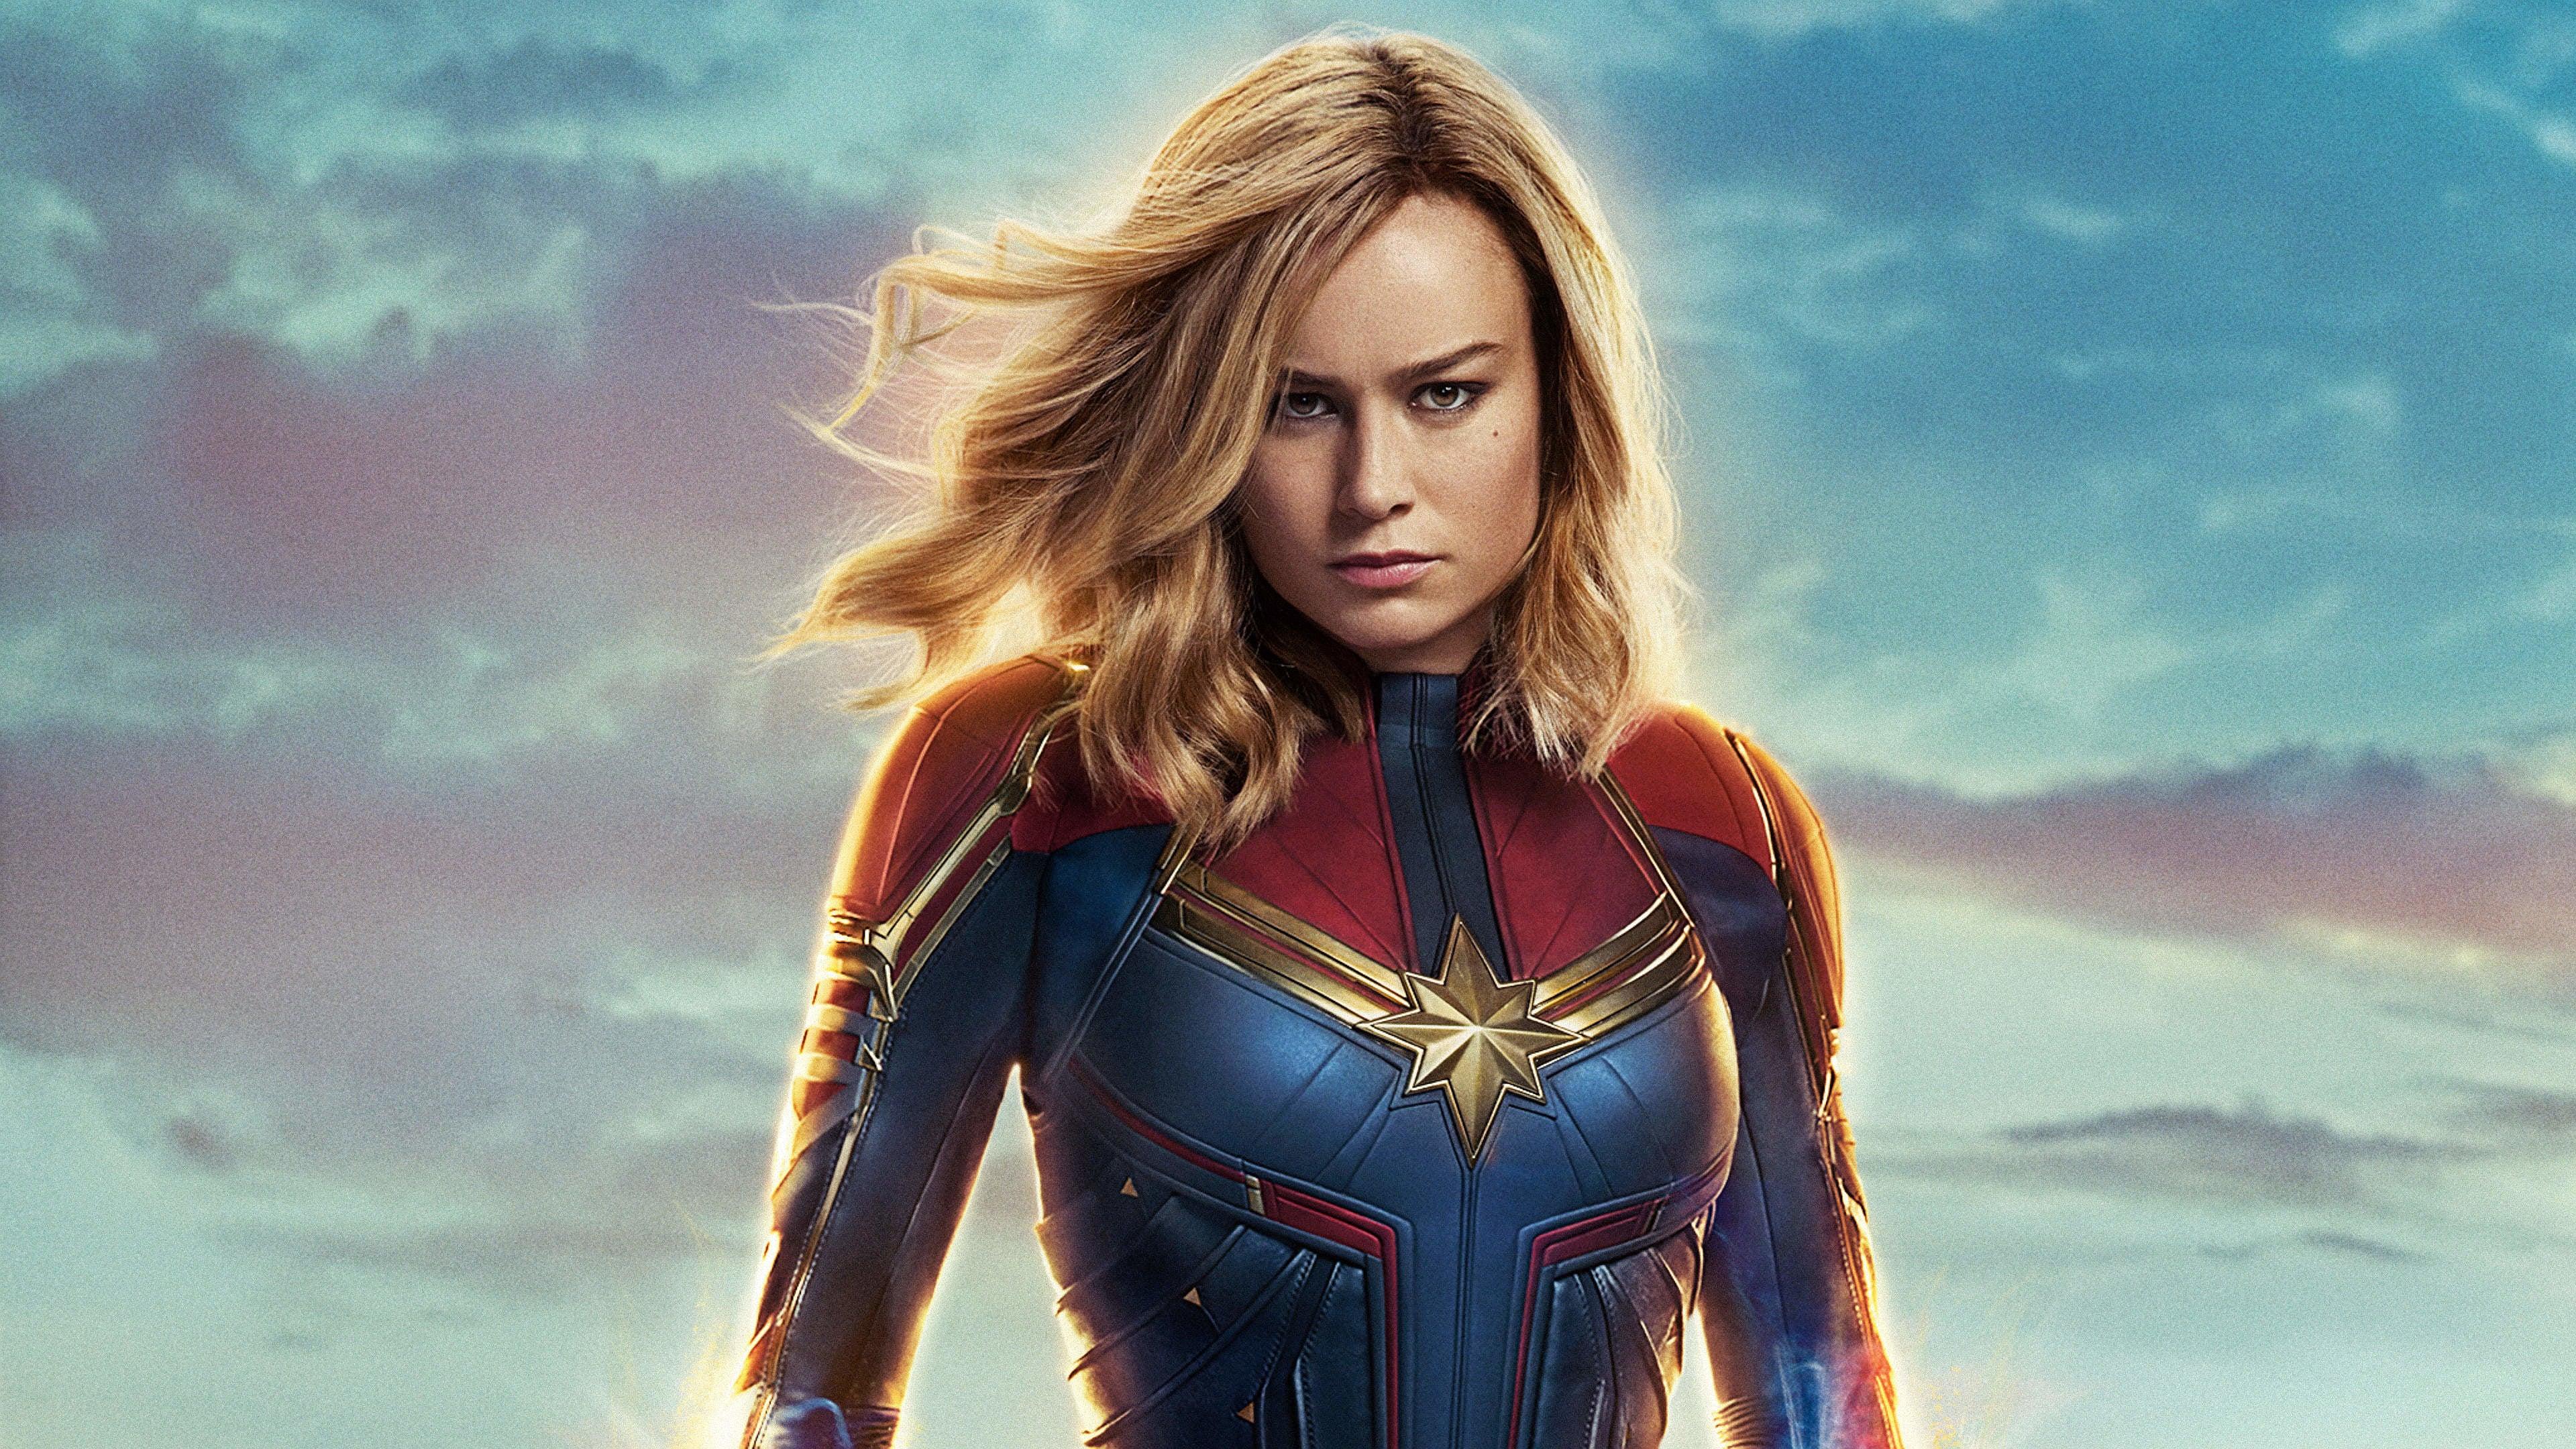 Captain Marvel Movie 4k 2019, HD Movies, 4k Wallpapers ...